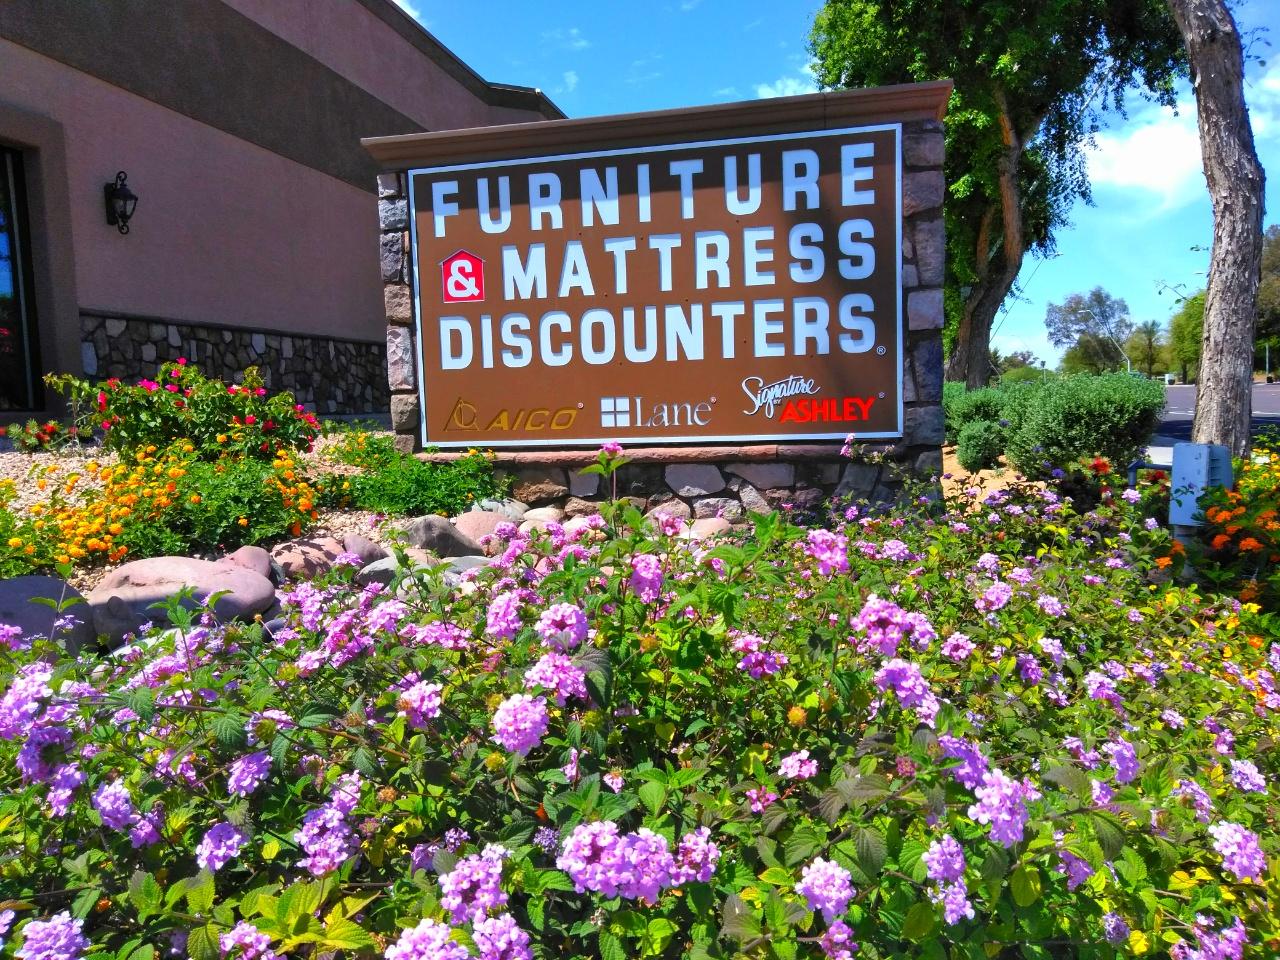 size azfurniture pictures design mesa of dallas furniture terrificure terrific and az full ga discounters mattress